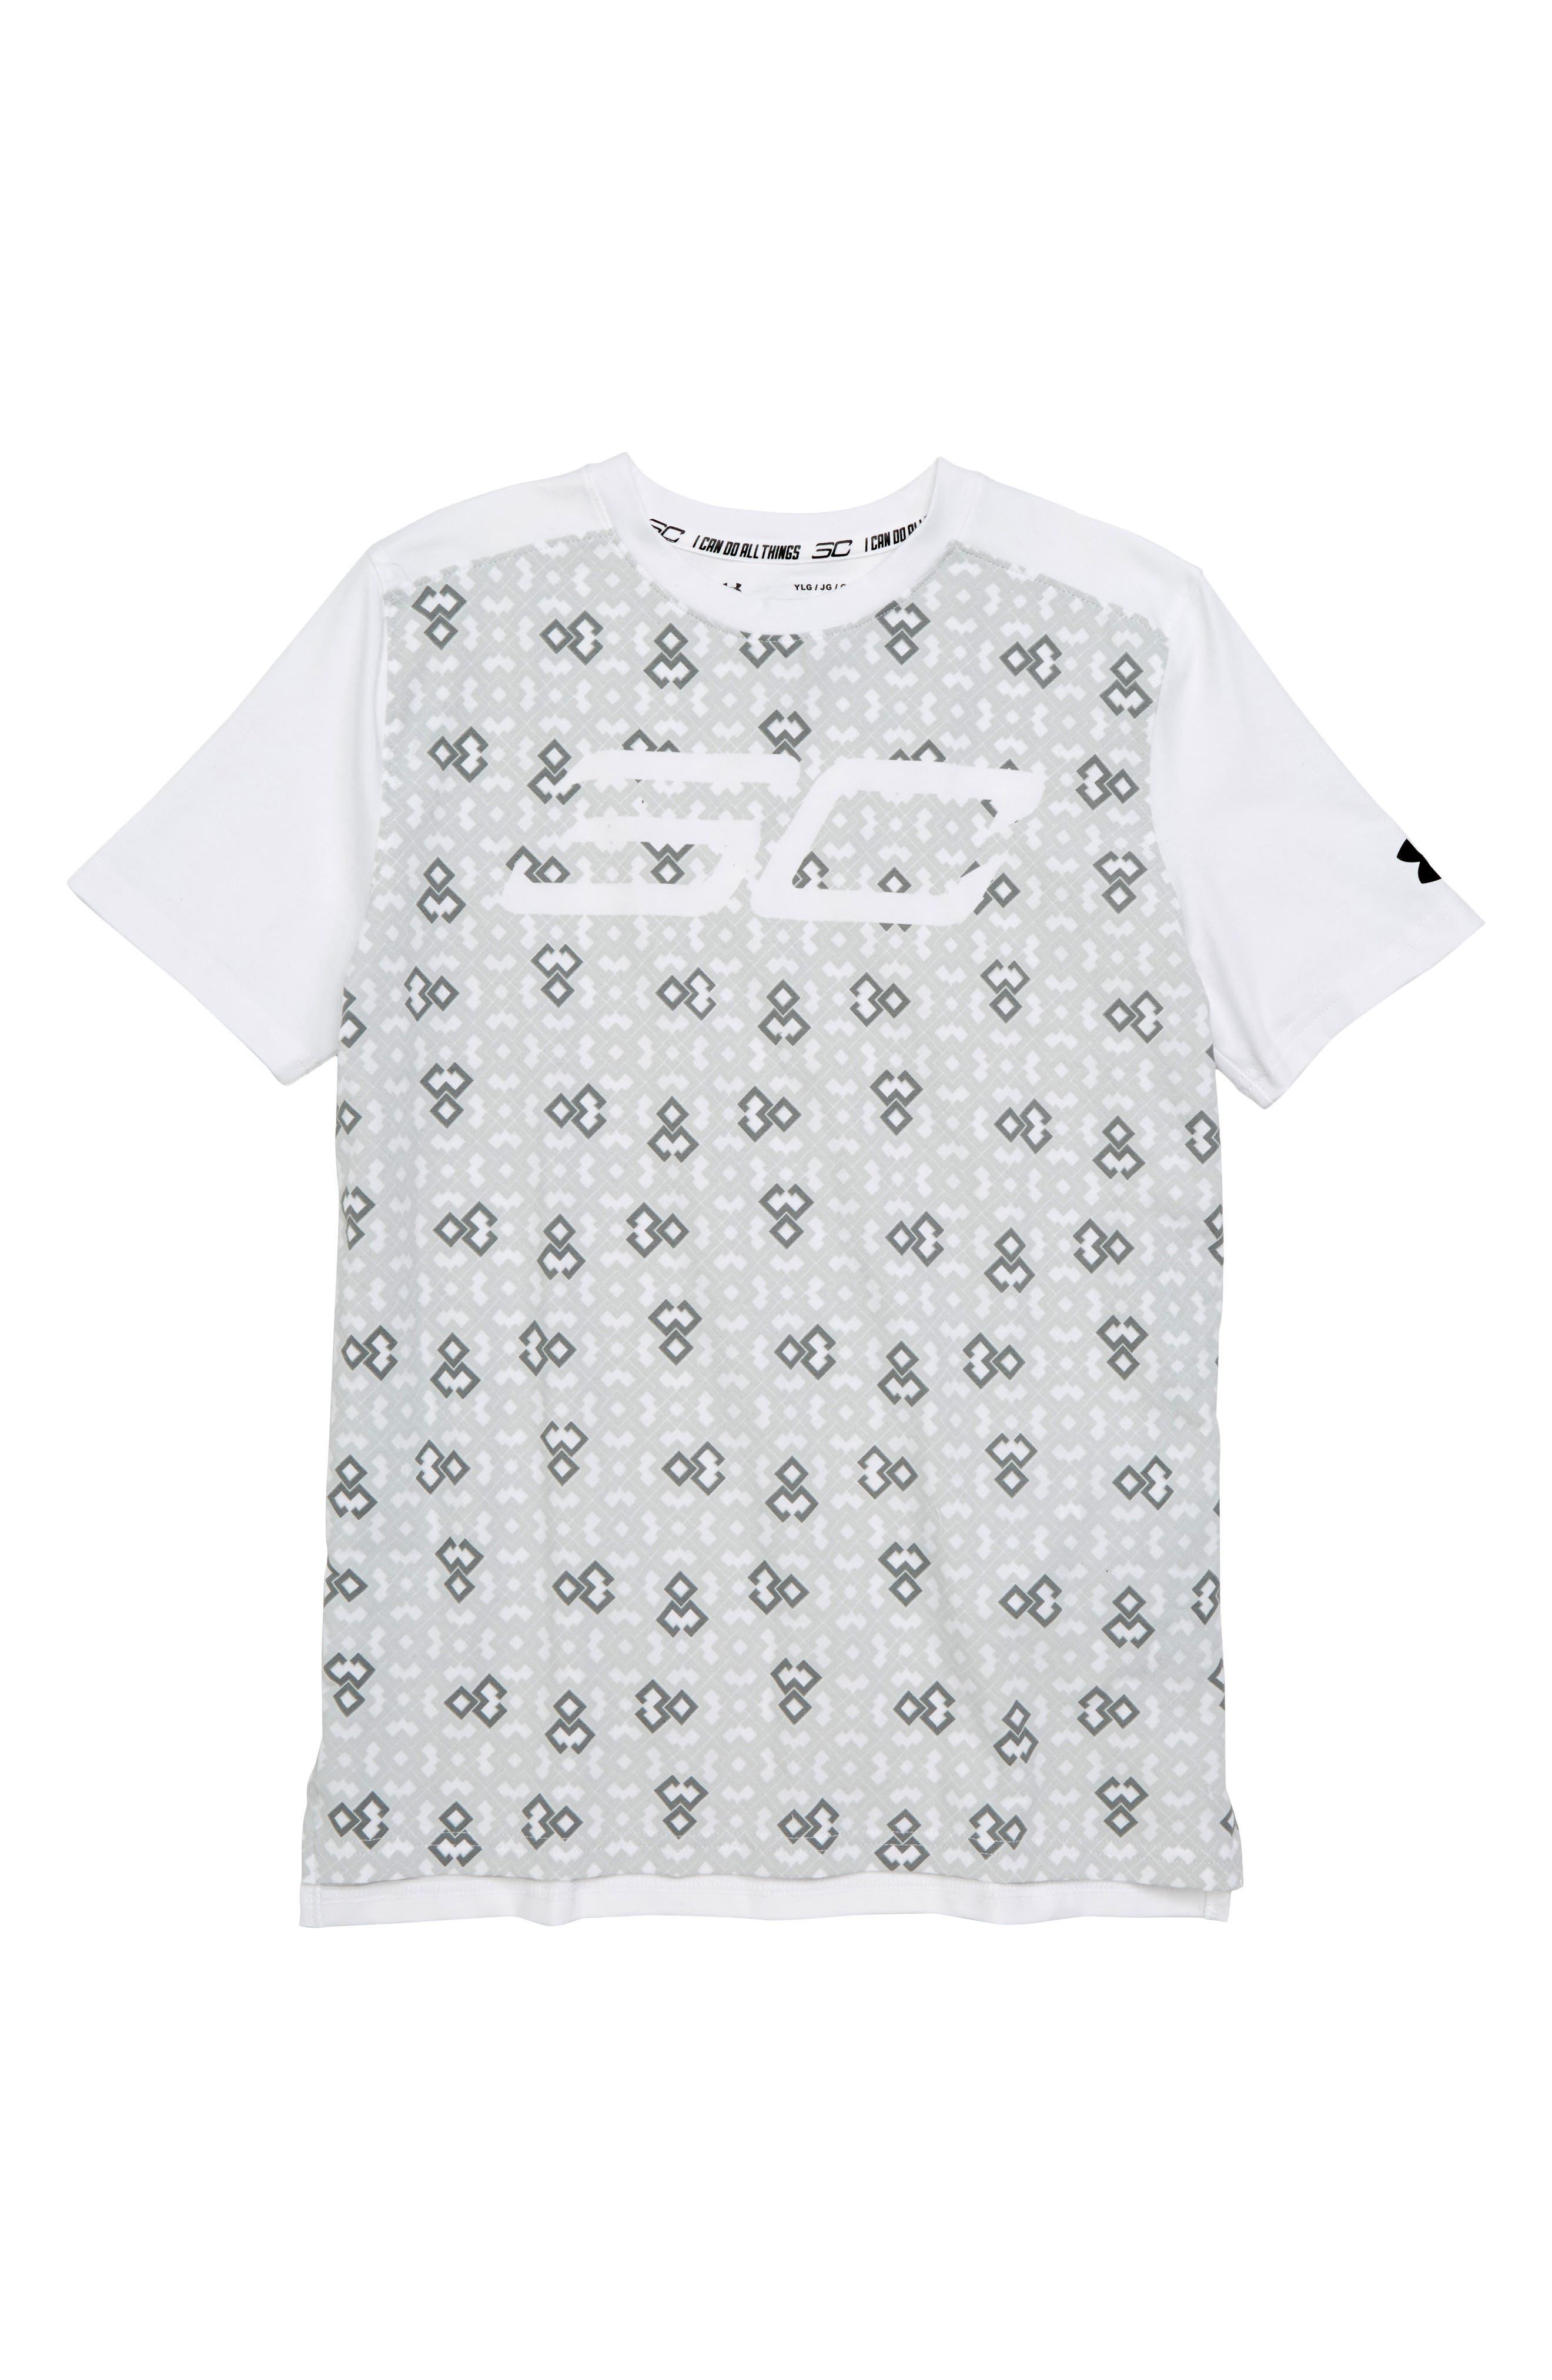 Performance SC30 HeatGear<sup>®</sup> Shirt,                             Main thumbnail 1, color,                             White/ Black